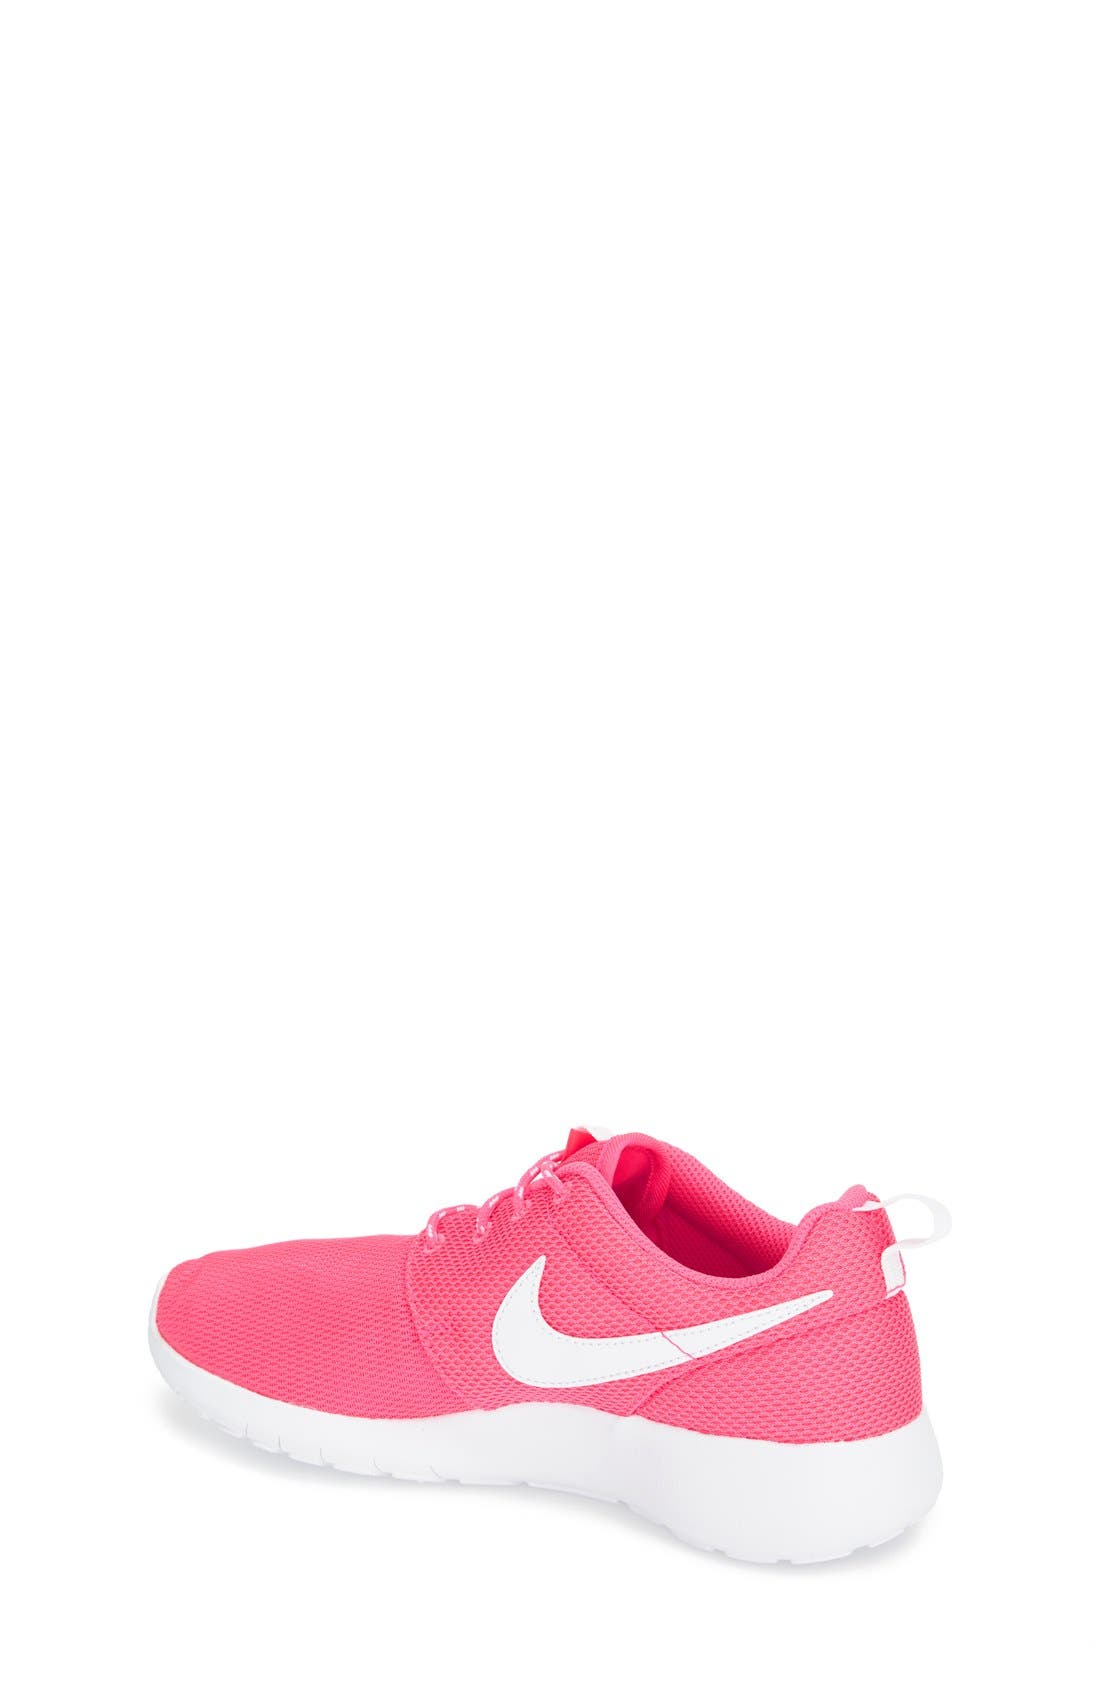 'Roshe Run' Athletic Shoe,                             Alternate thumbnail 182, color,